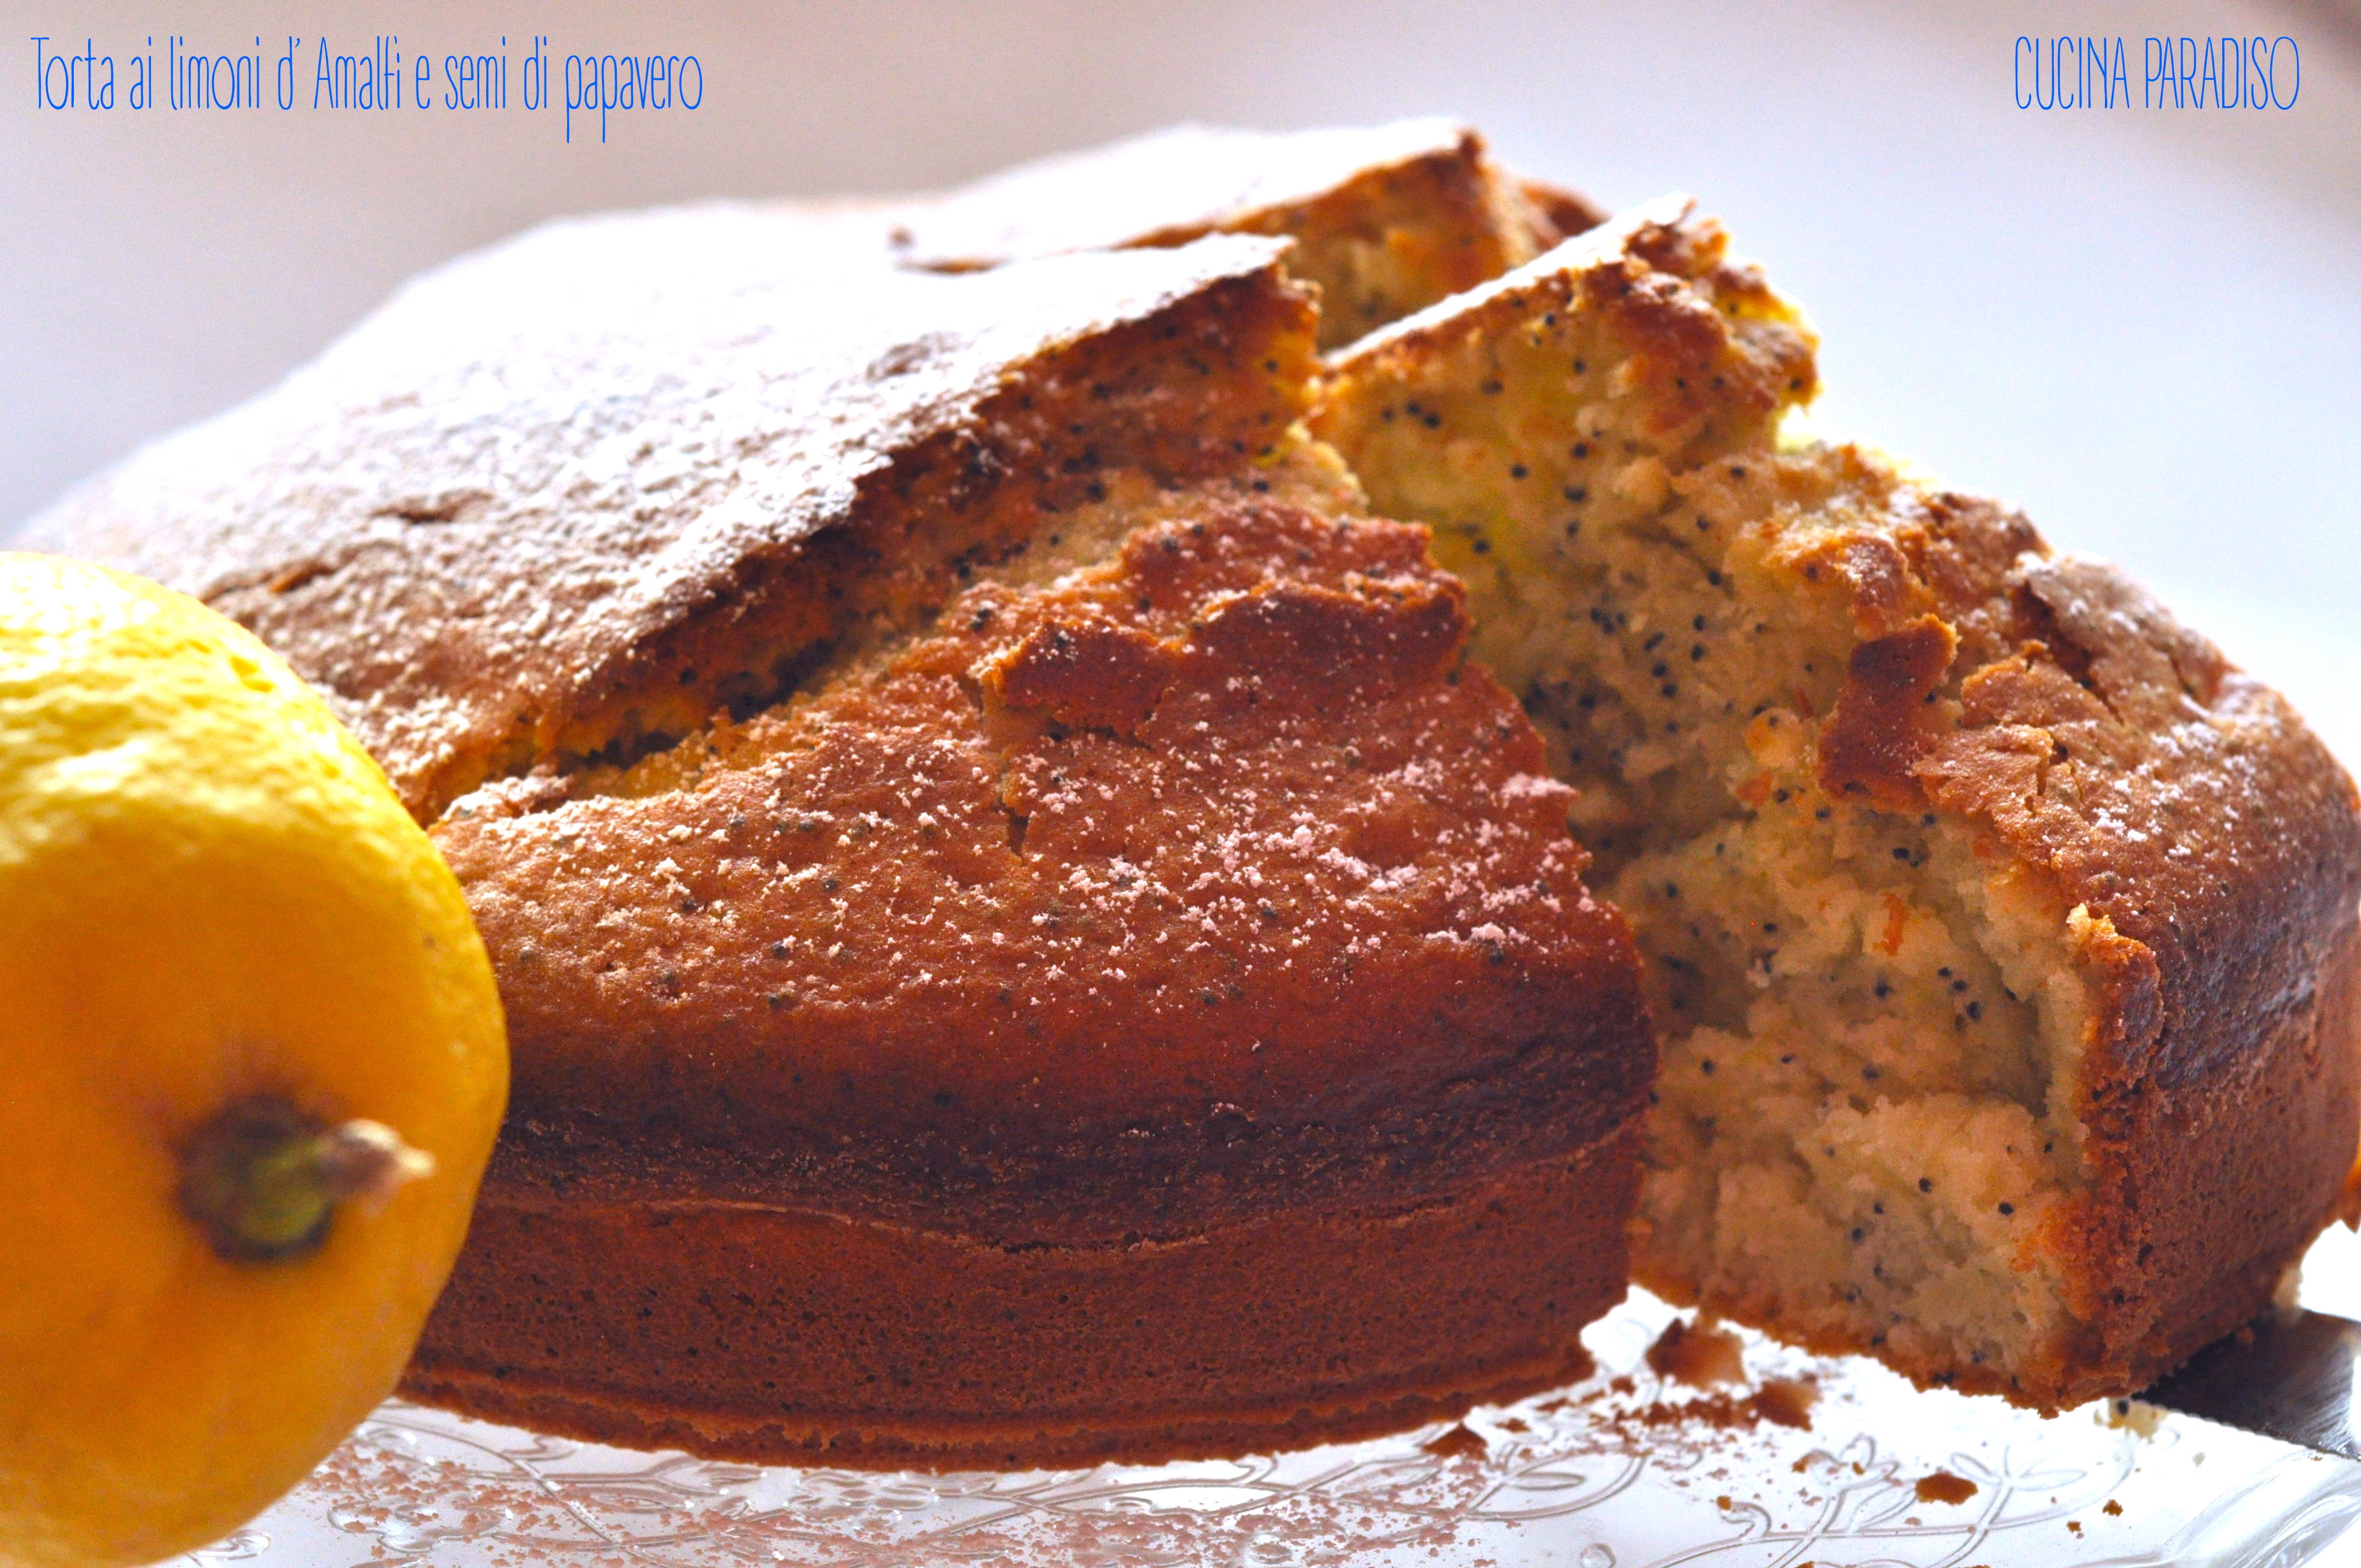 Torta ai limoni d' Amalfi e semi di papavero5